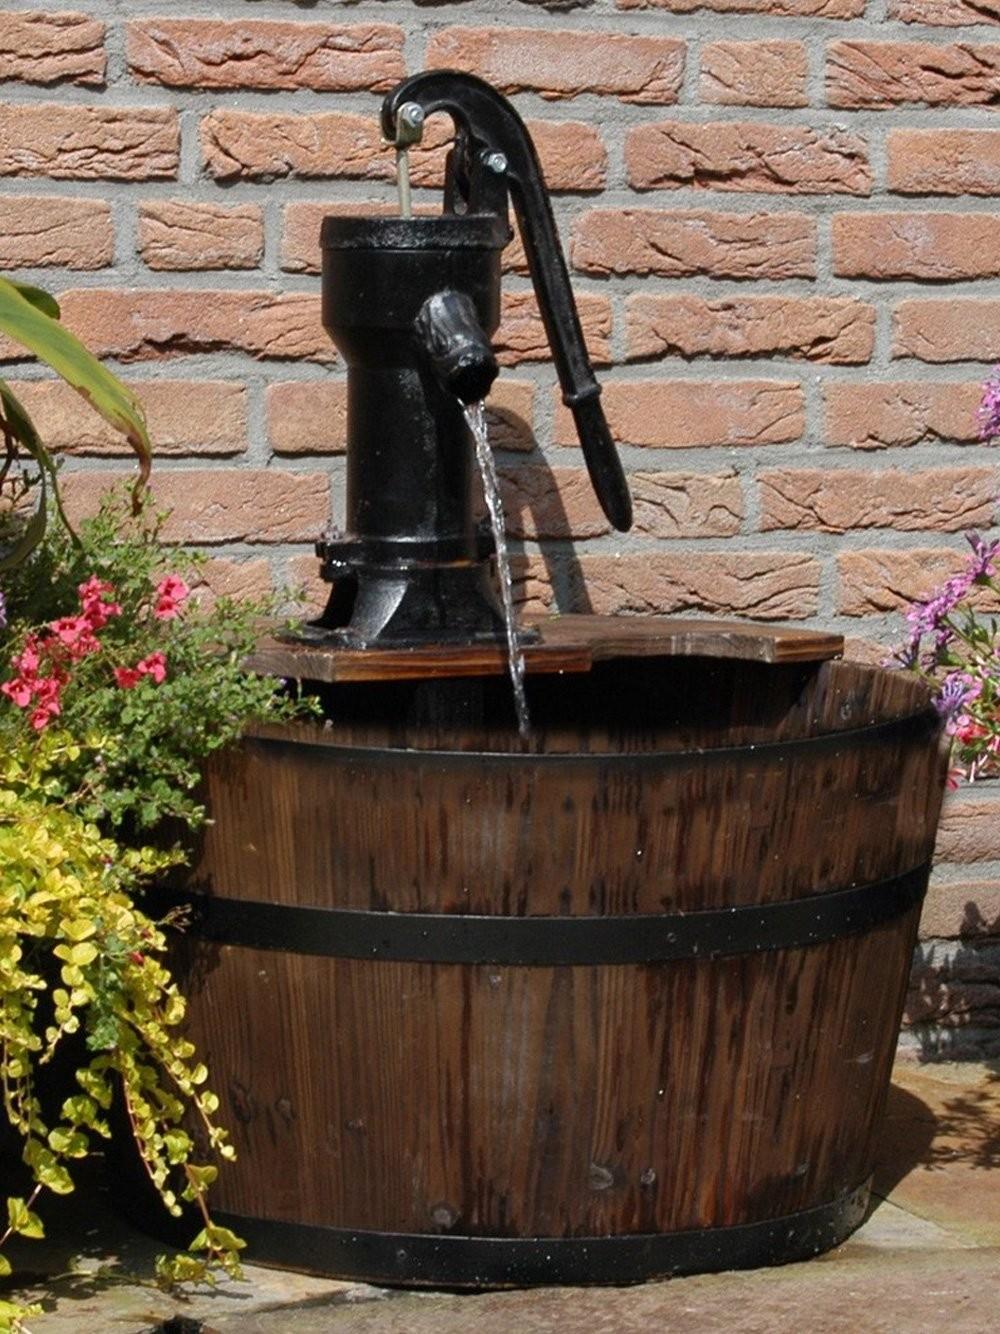 Newcastle Wooden Barrel With Pump Garden Water Feature